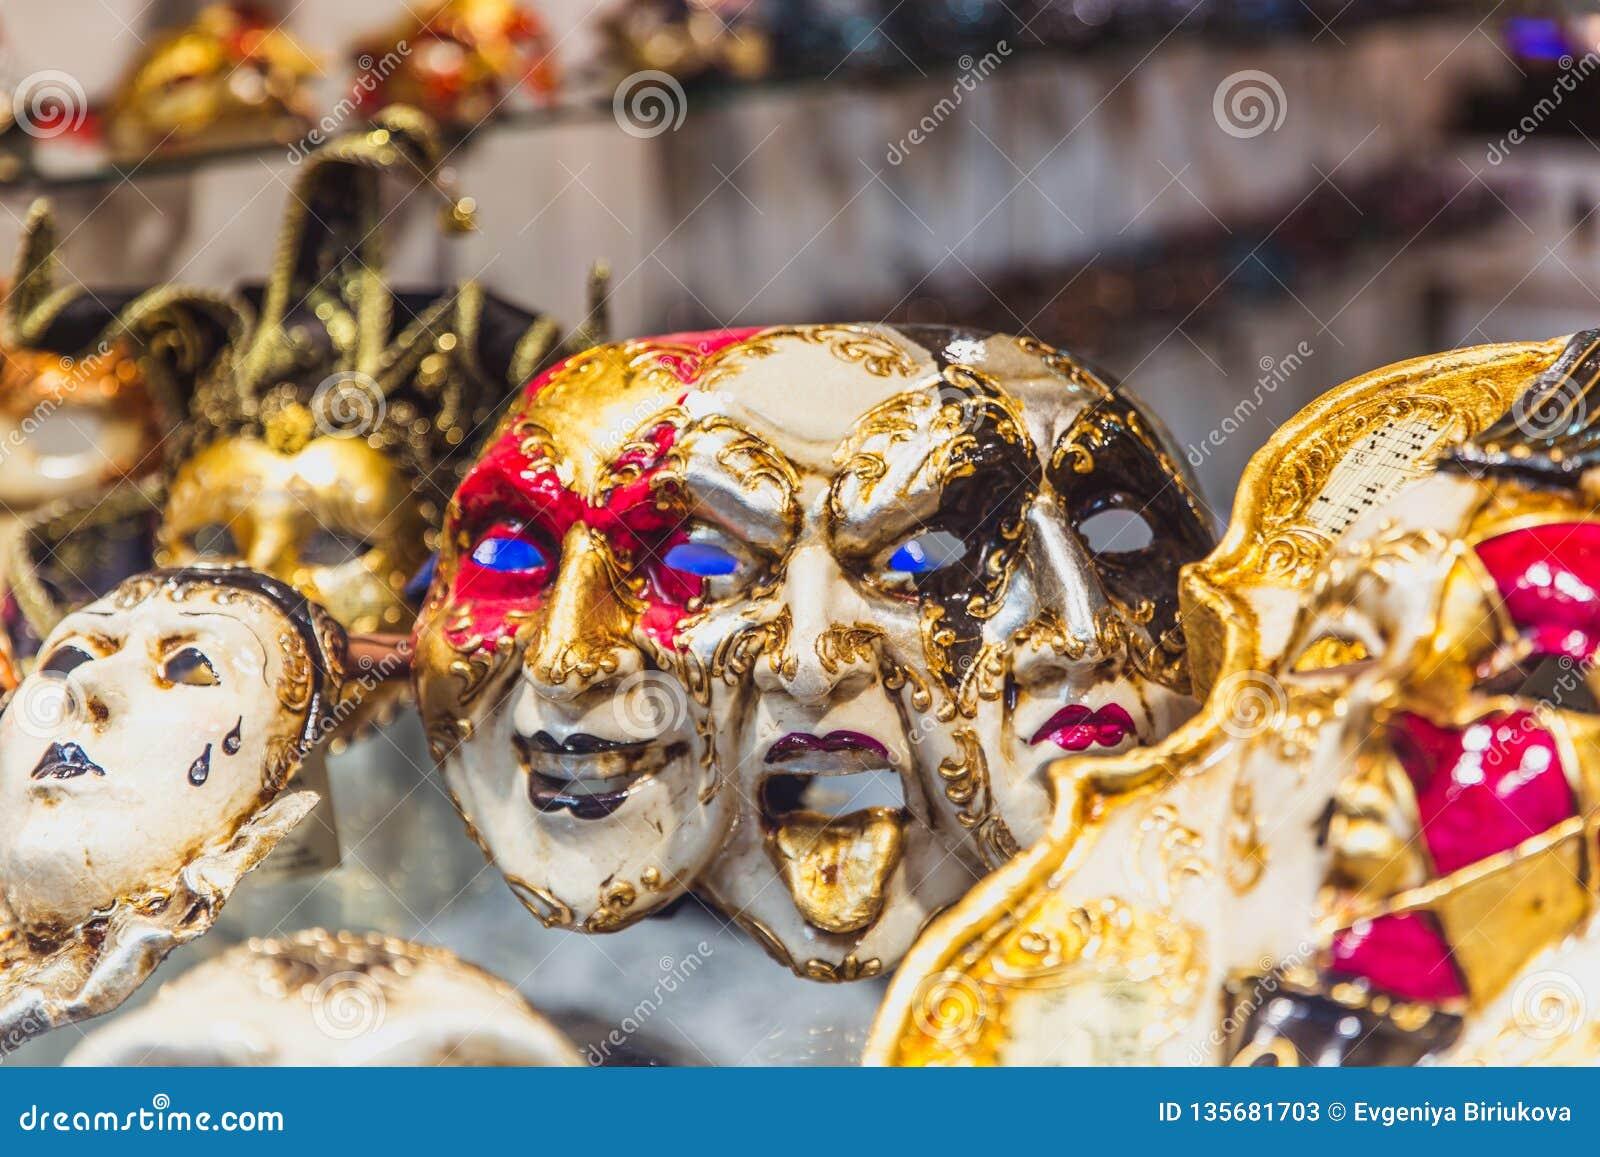 VENETIË, ITALIË - OKTOBER 27, 2016: Het authentieke masker van colorfull met de hand gemaakte Venetiaanse Carnaval in Venetië, It